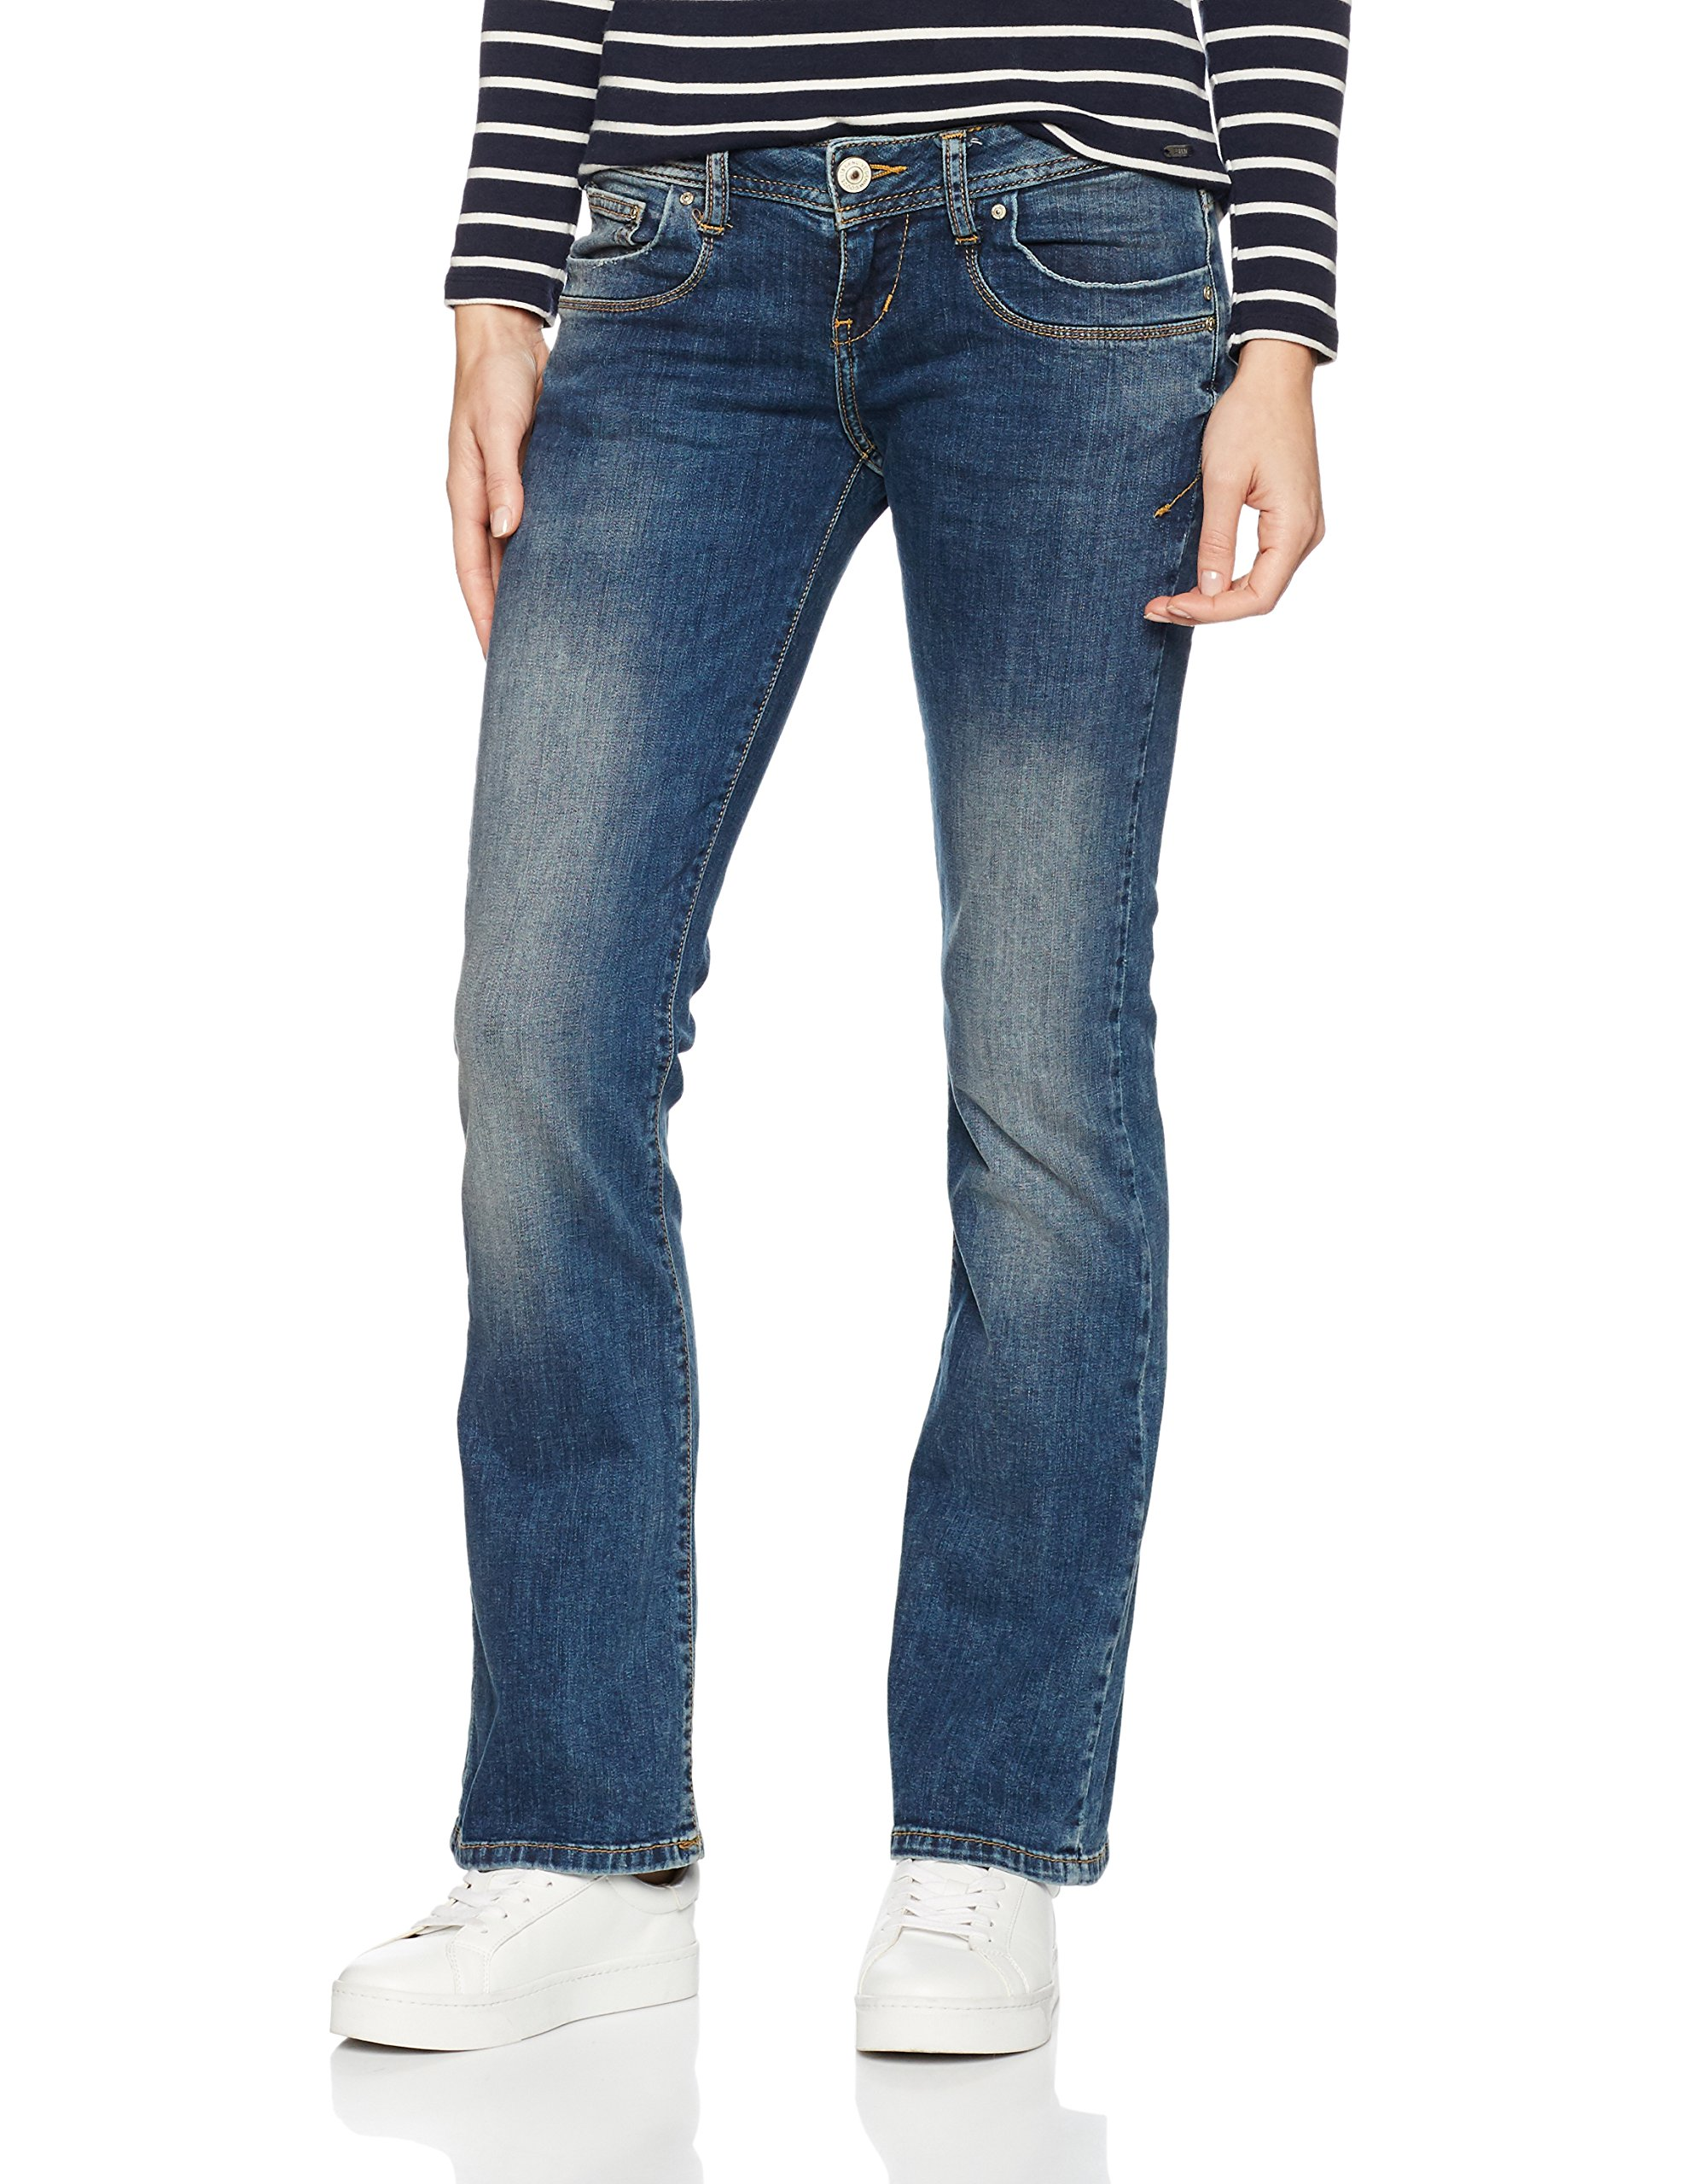 Ltb Coupe Wash Jean Jeans Valerie Femme 34l 5106929w BootcutBlaunuage X dCsQthr